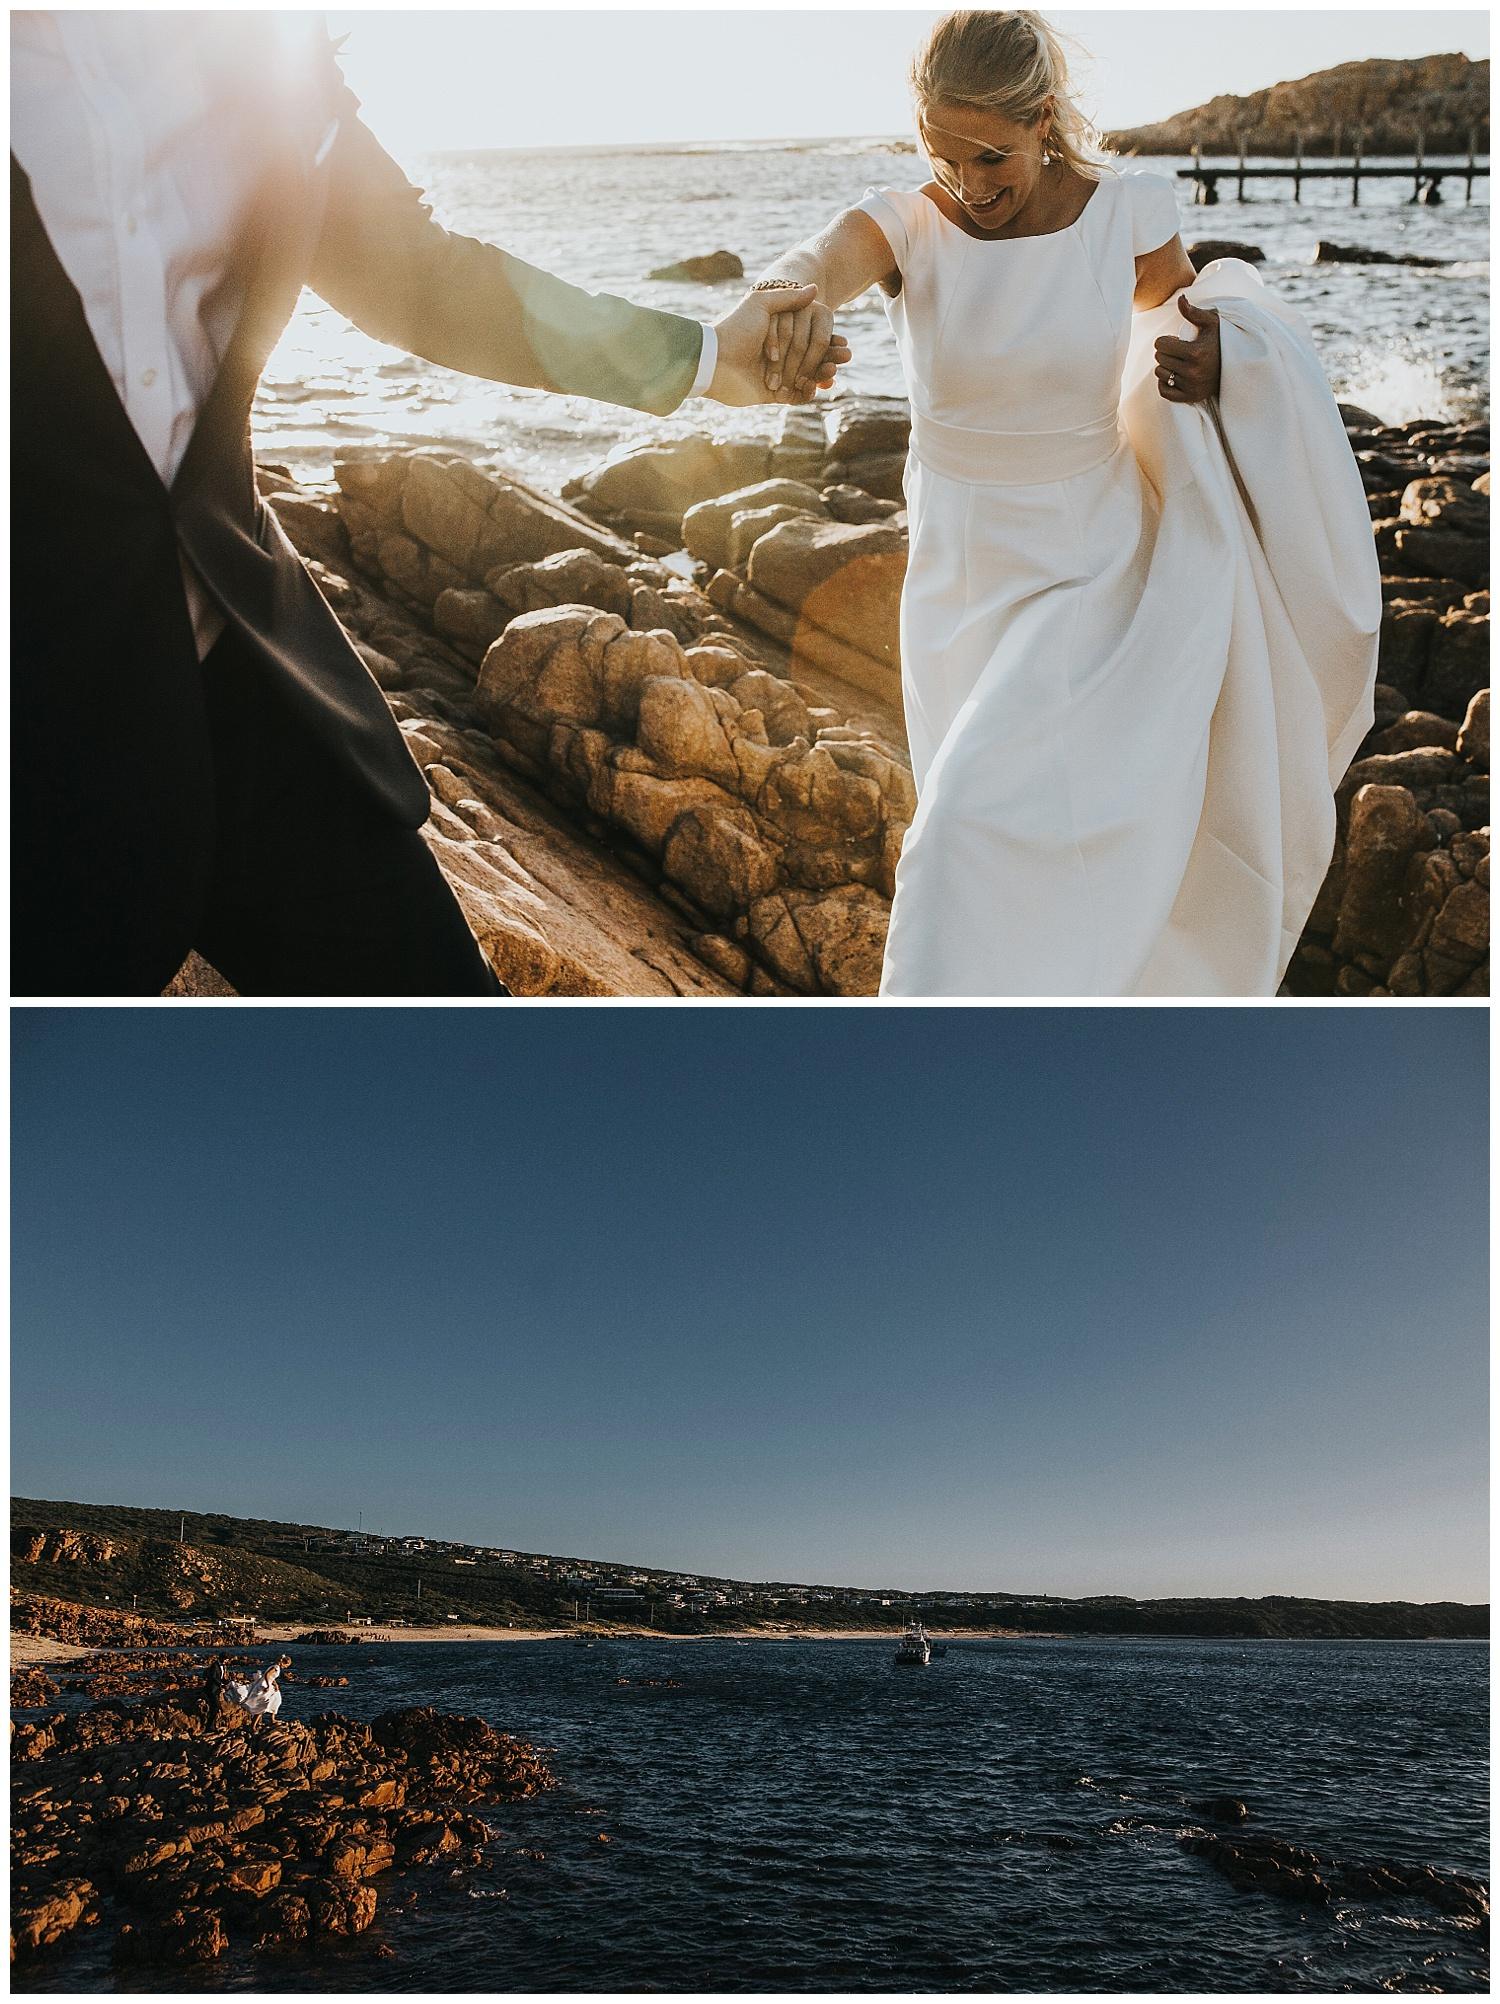 olio_bello_wedding_keeper_creative_028.JPG